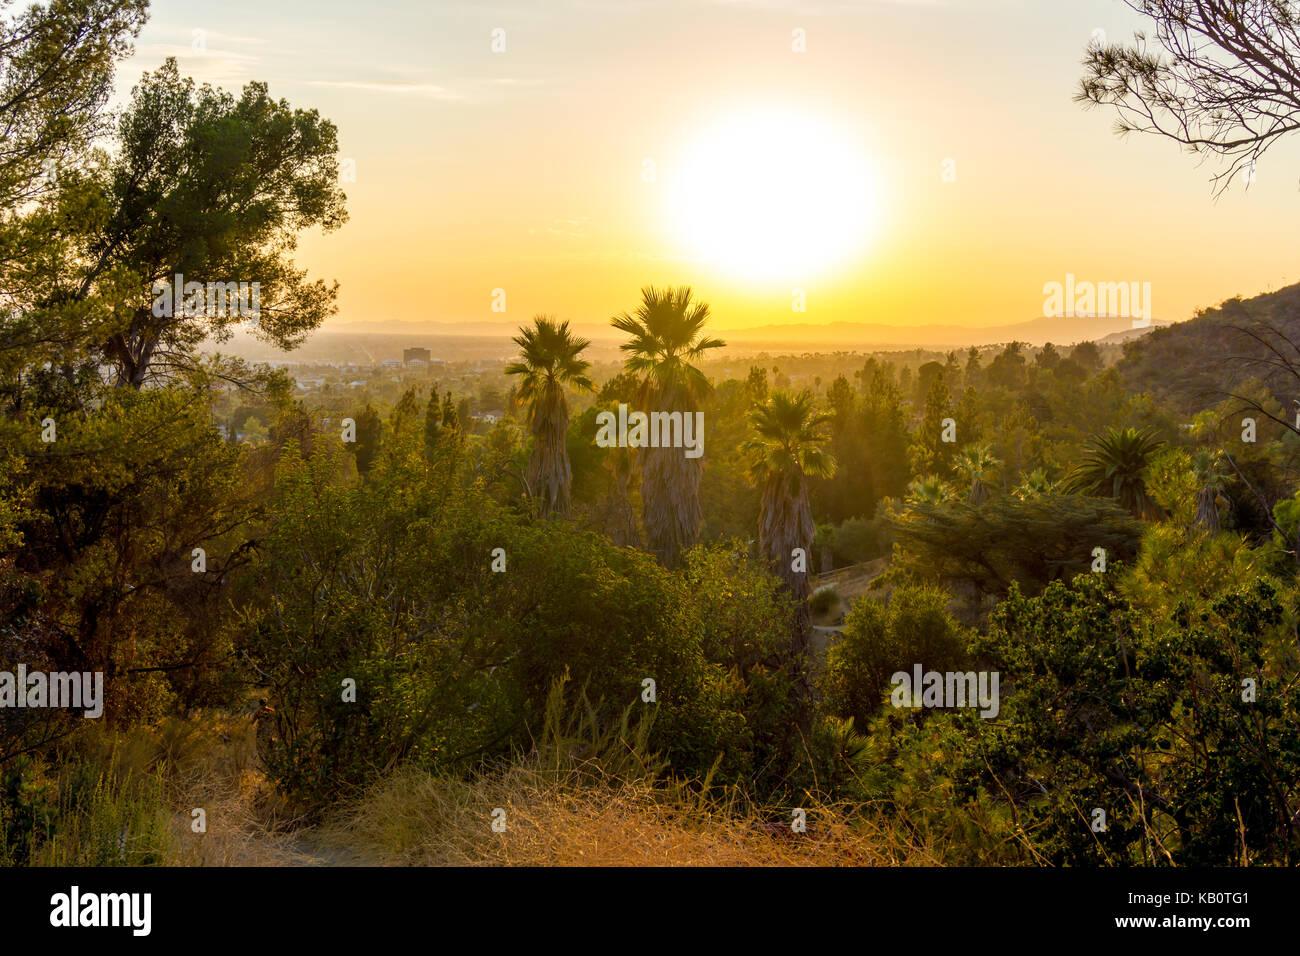 Sunset over san fernando valley - Stock Image